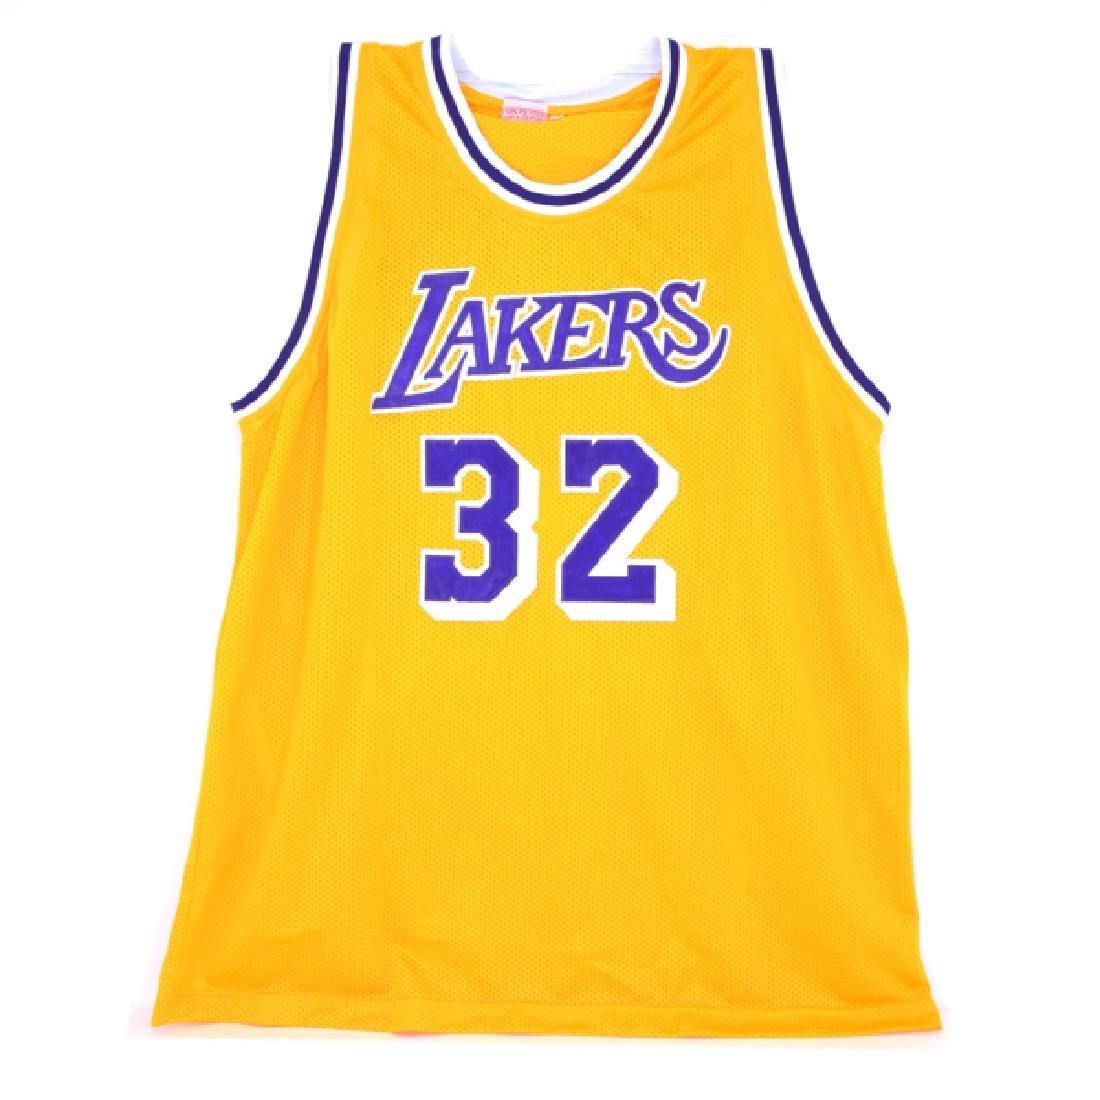 Very Rare Magic Johnson Signed Lakers Jersey